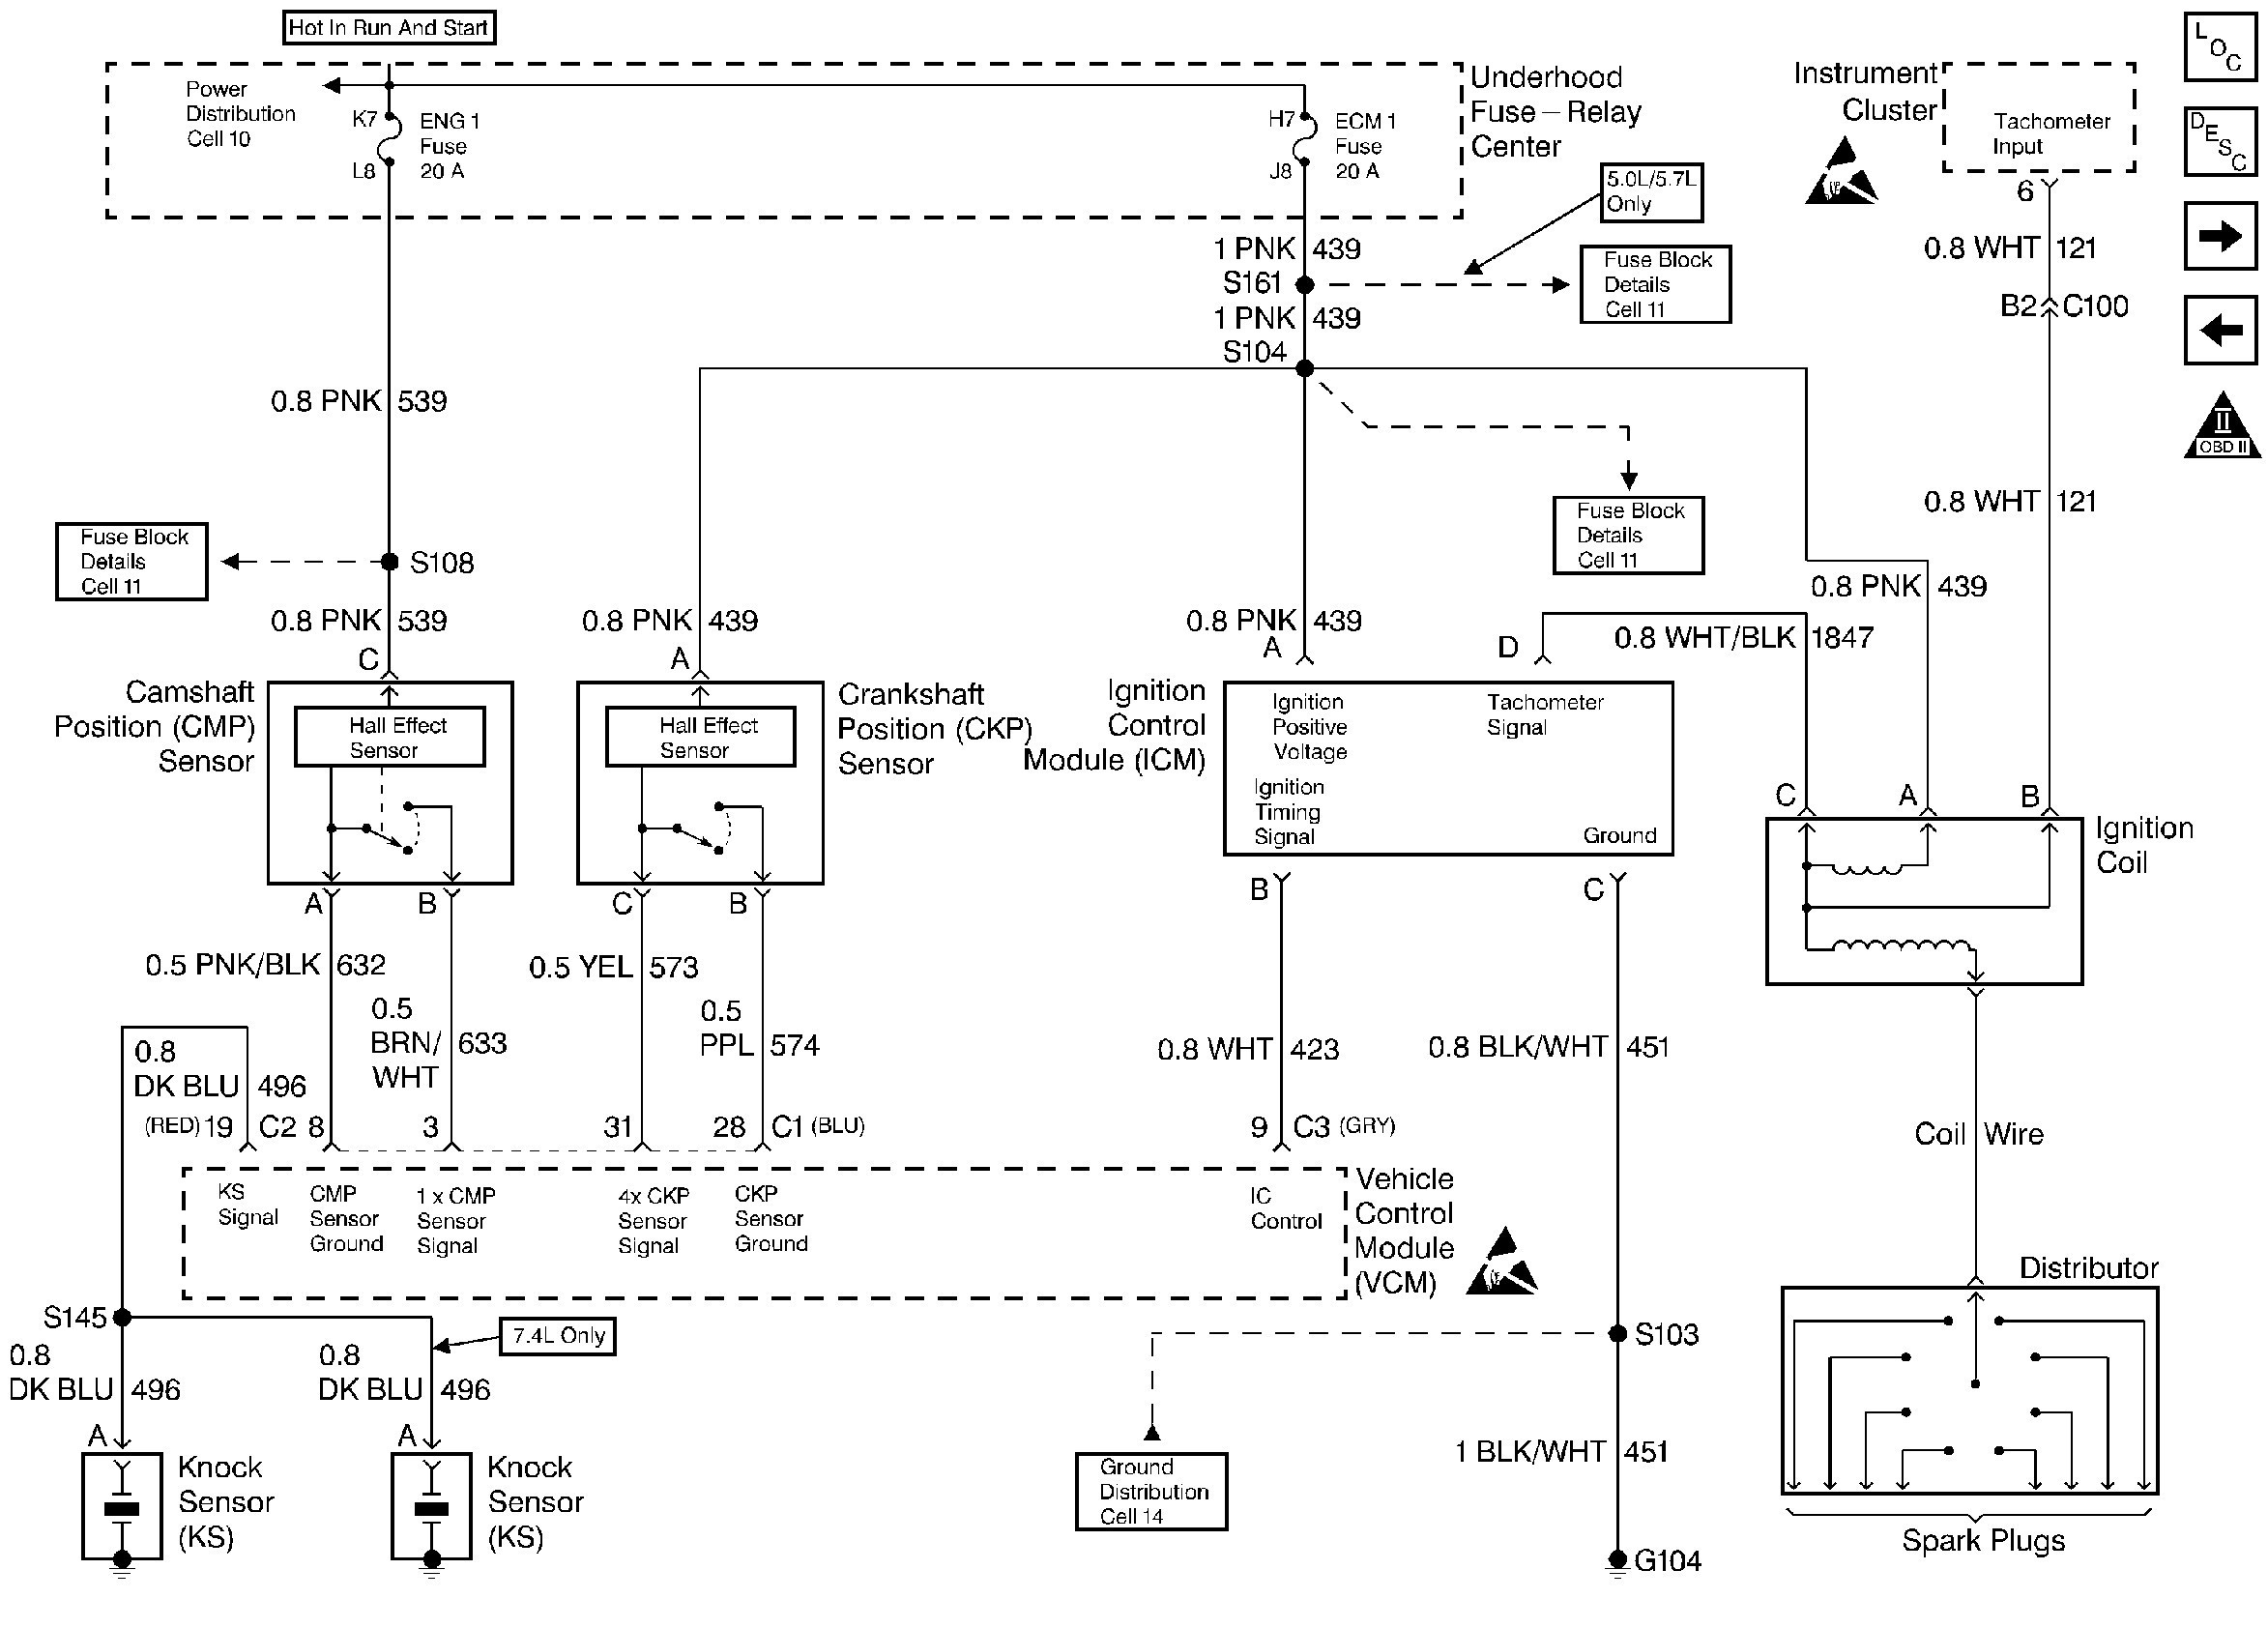 5 8 Liter Engine Diagram Car Wiring Diagrams Explained \u2022 3.1 Liter Chevy  Engine 3 1 Liter Engine Diagram